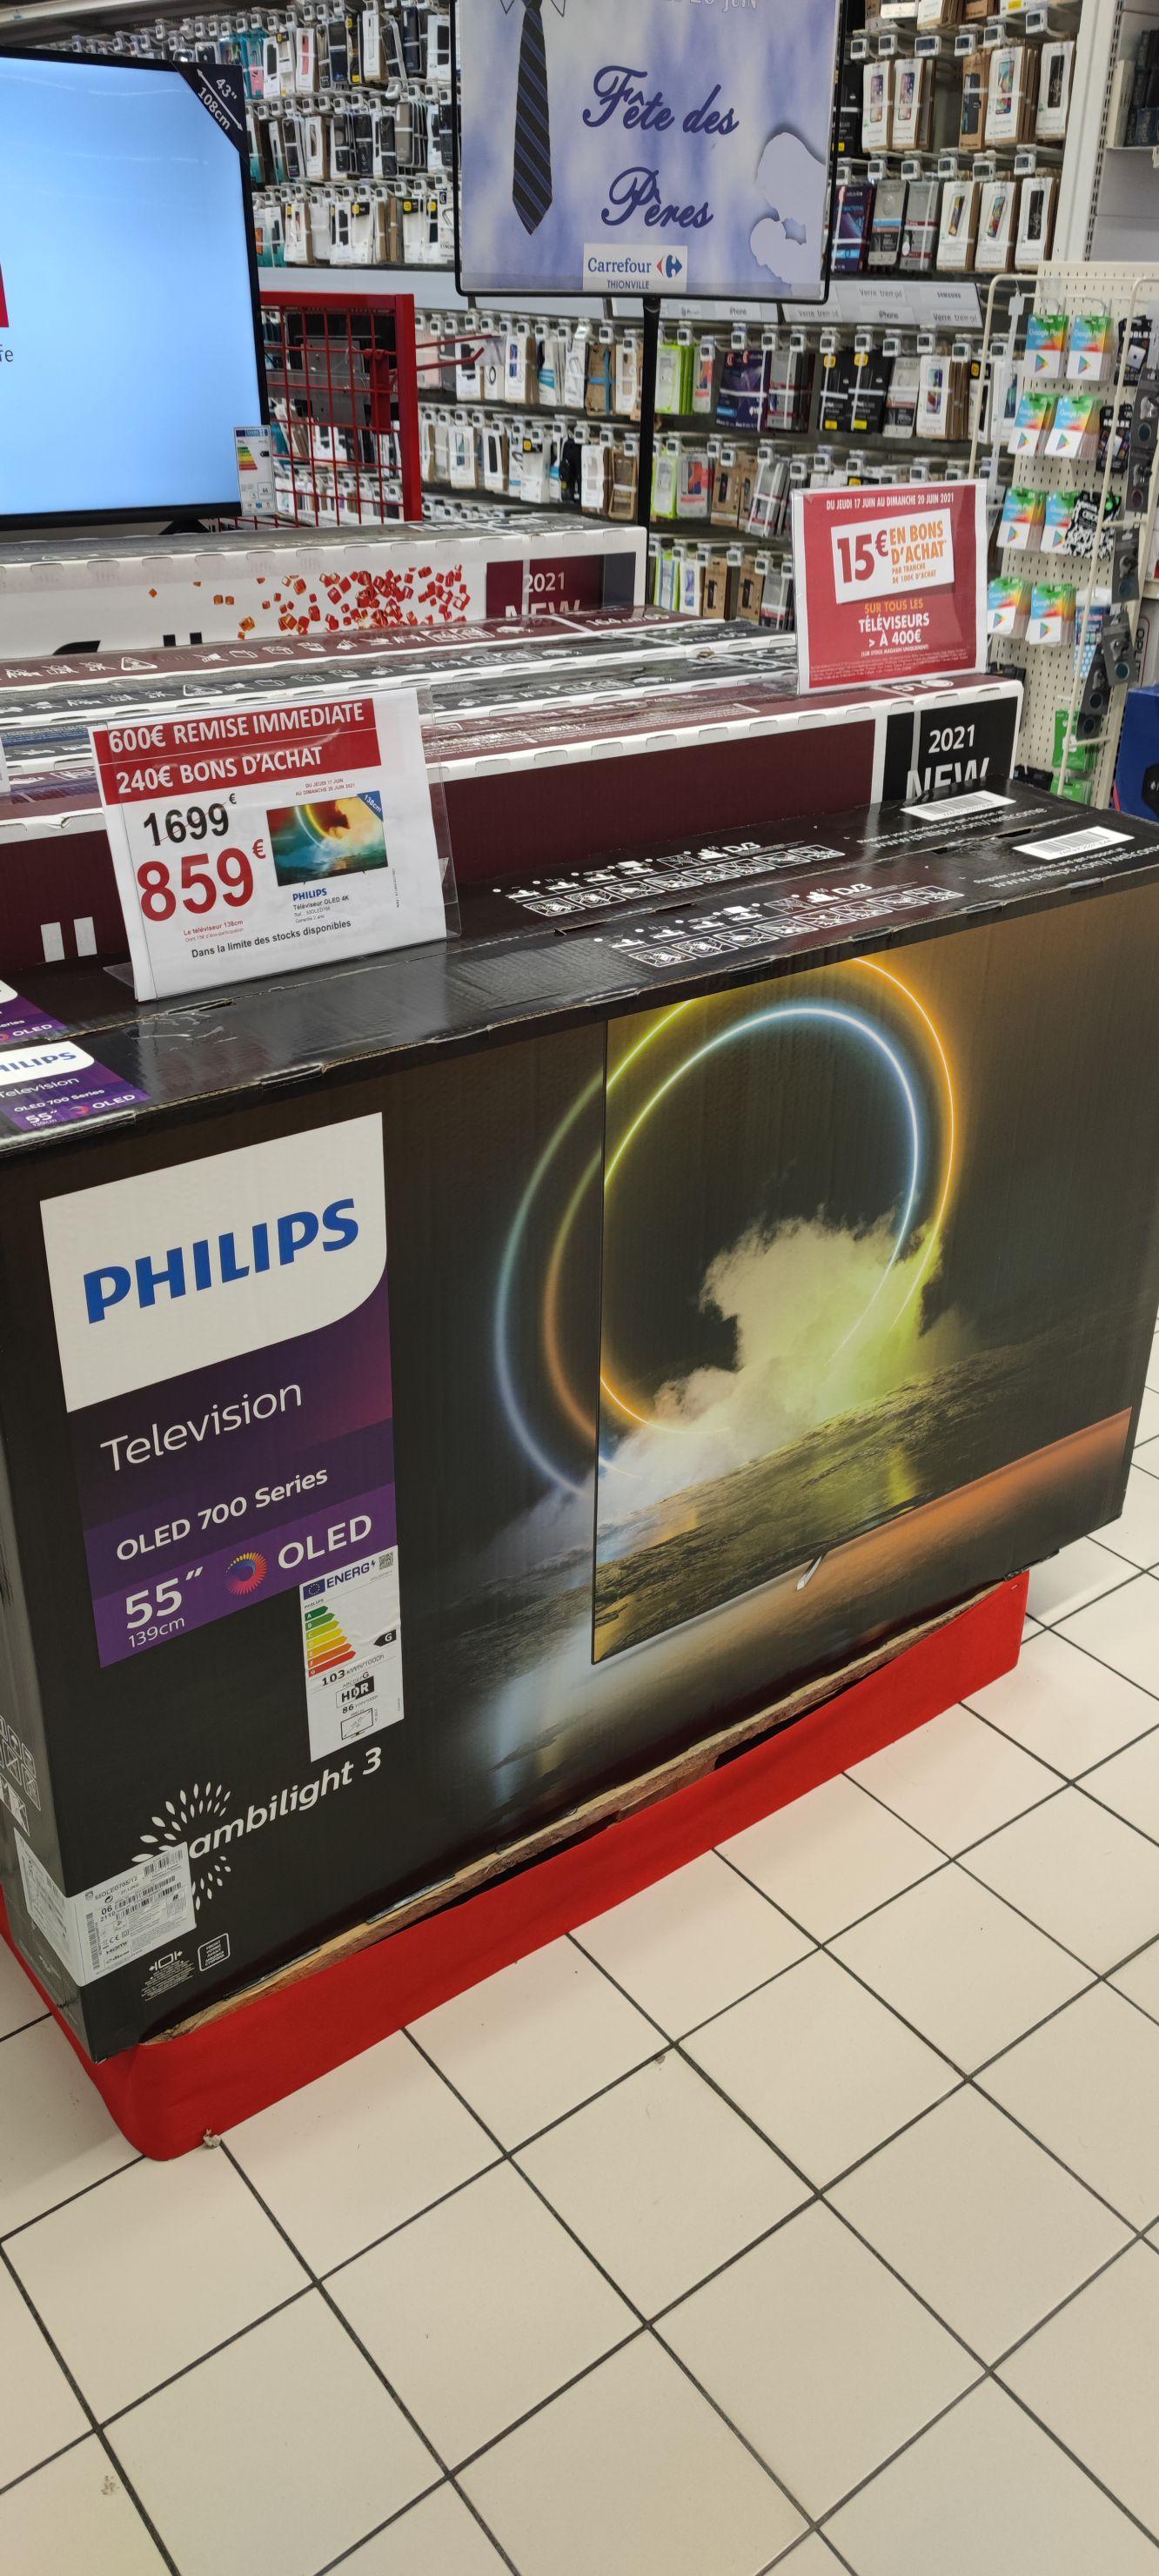 "TV OLED 55"" Philips 55OLED705 - 4K UHD, Smart TV, Ambilight 3 côtés (Via 240€ en bons d'achats) - Thionville (57)"